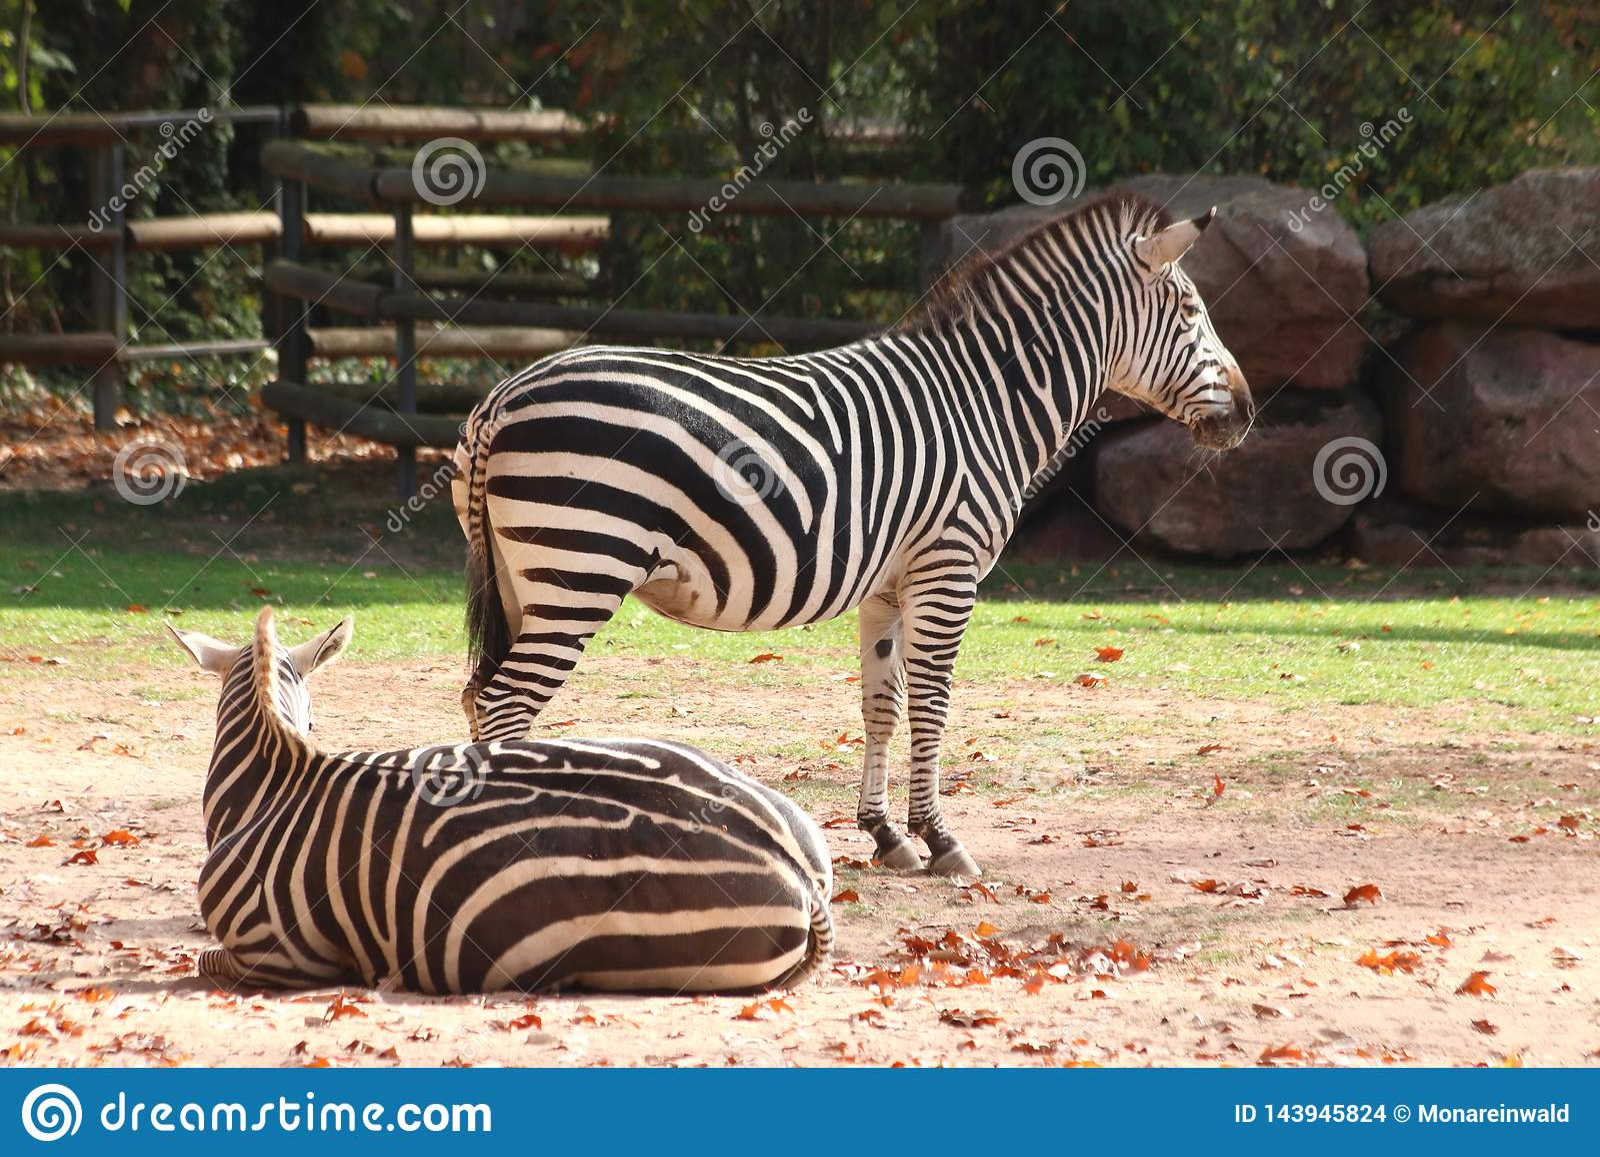 Two zebras standing in zoo in nuremberg